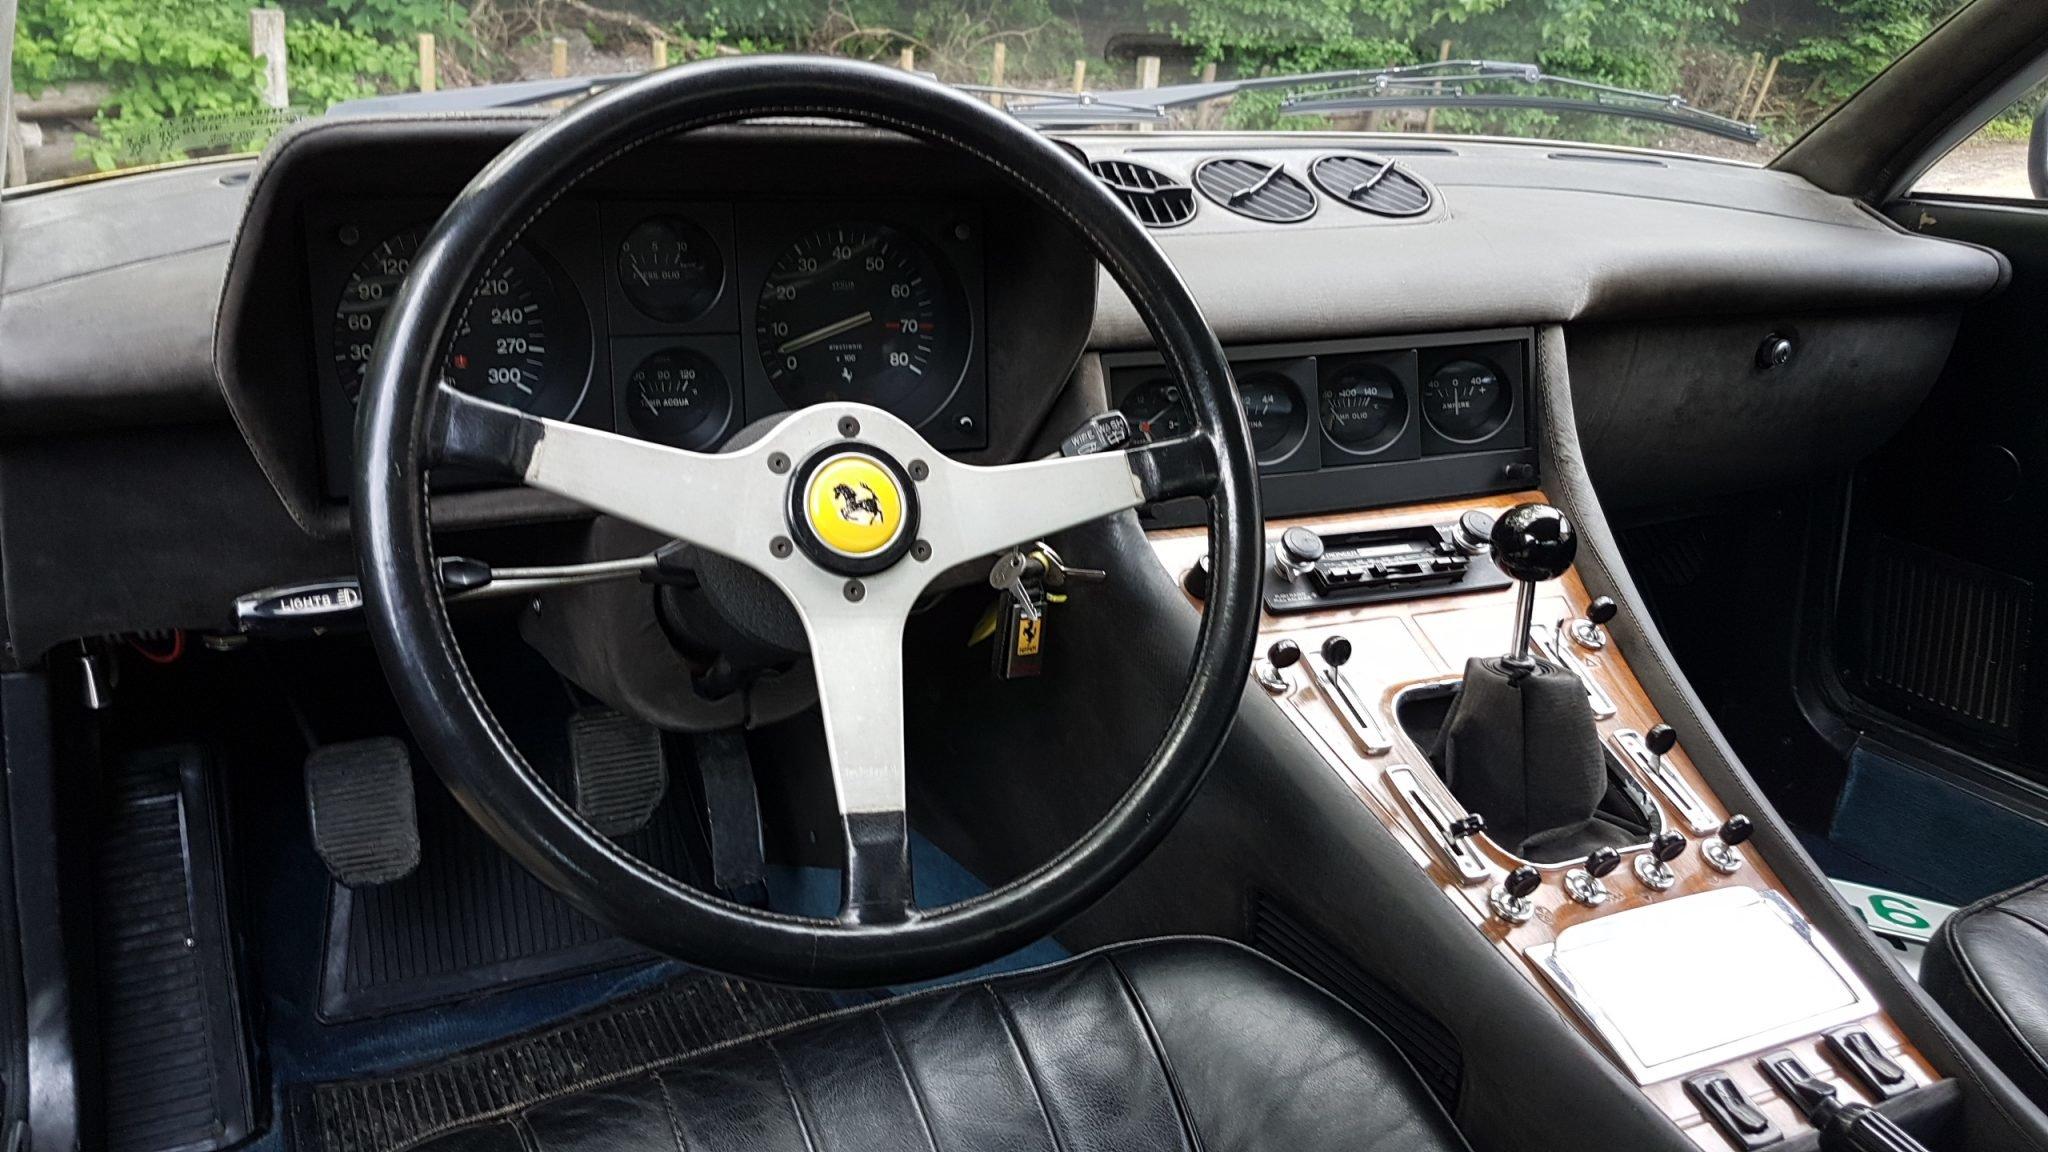 1975 Ferrari 365 GT4 2+2 For Sale (picture 6 of 6)